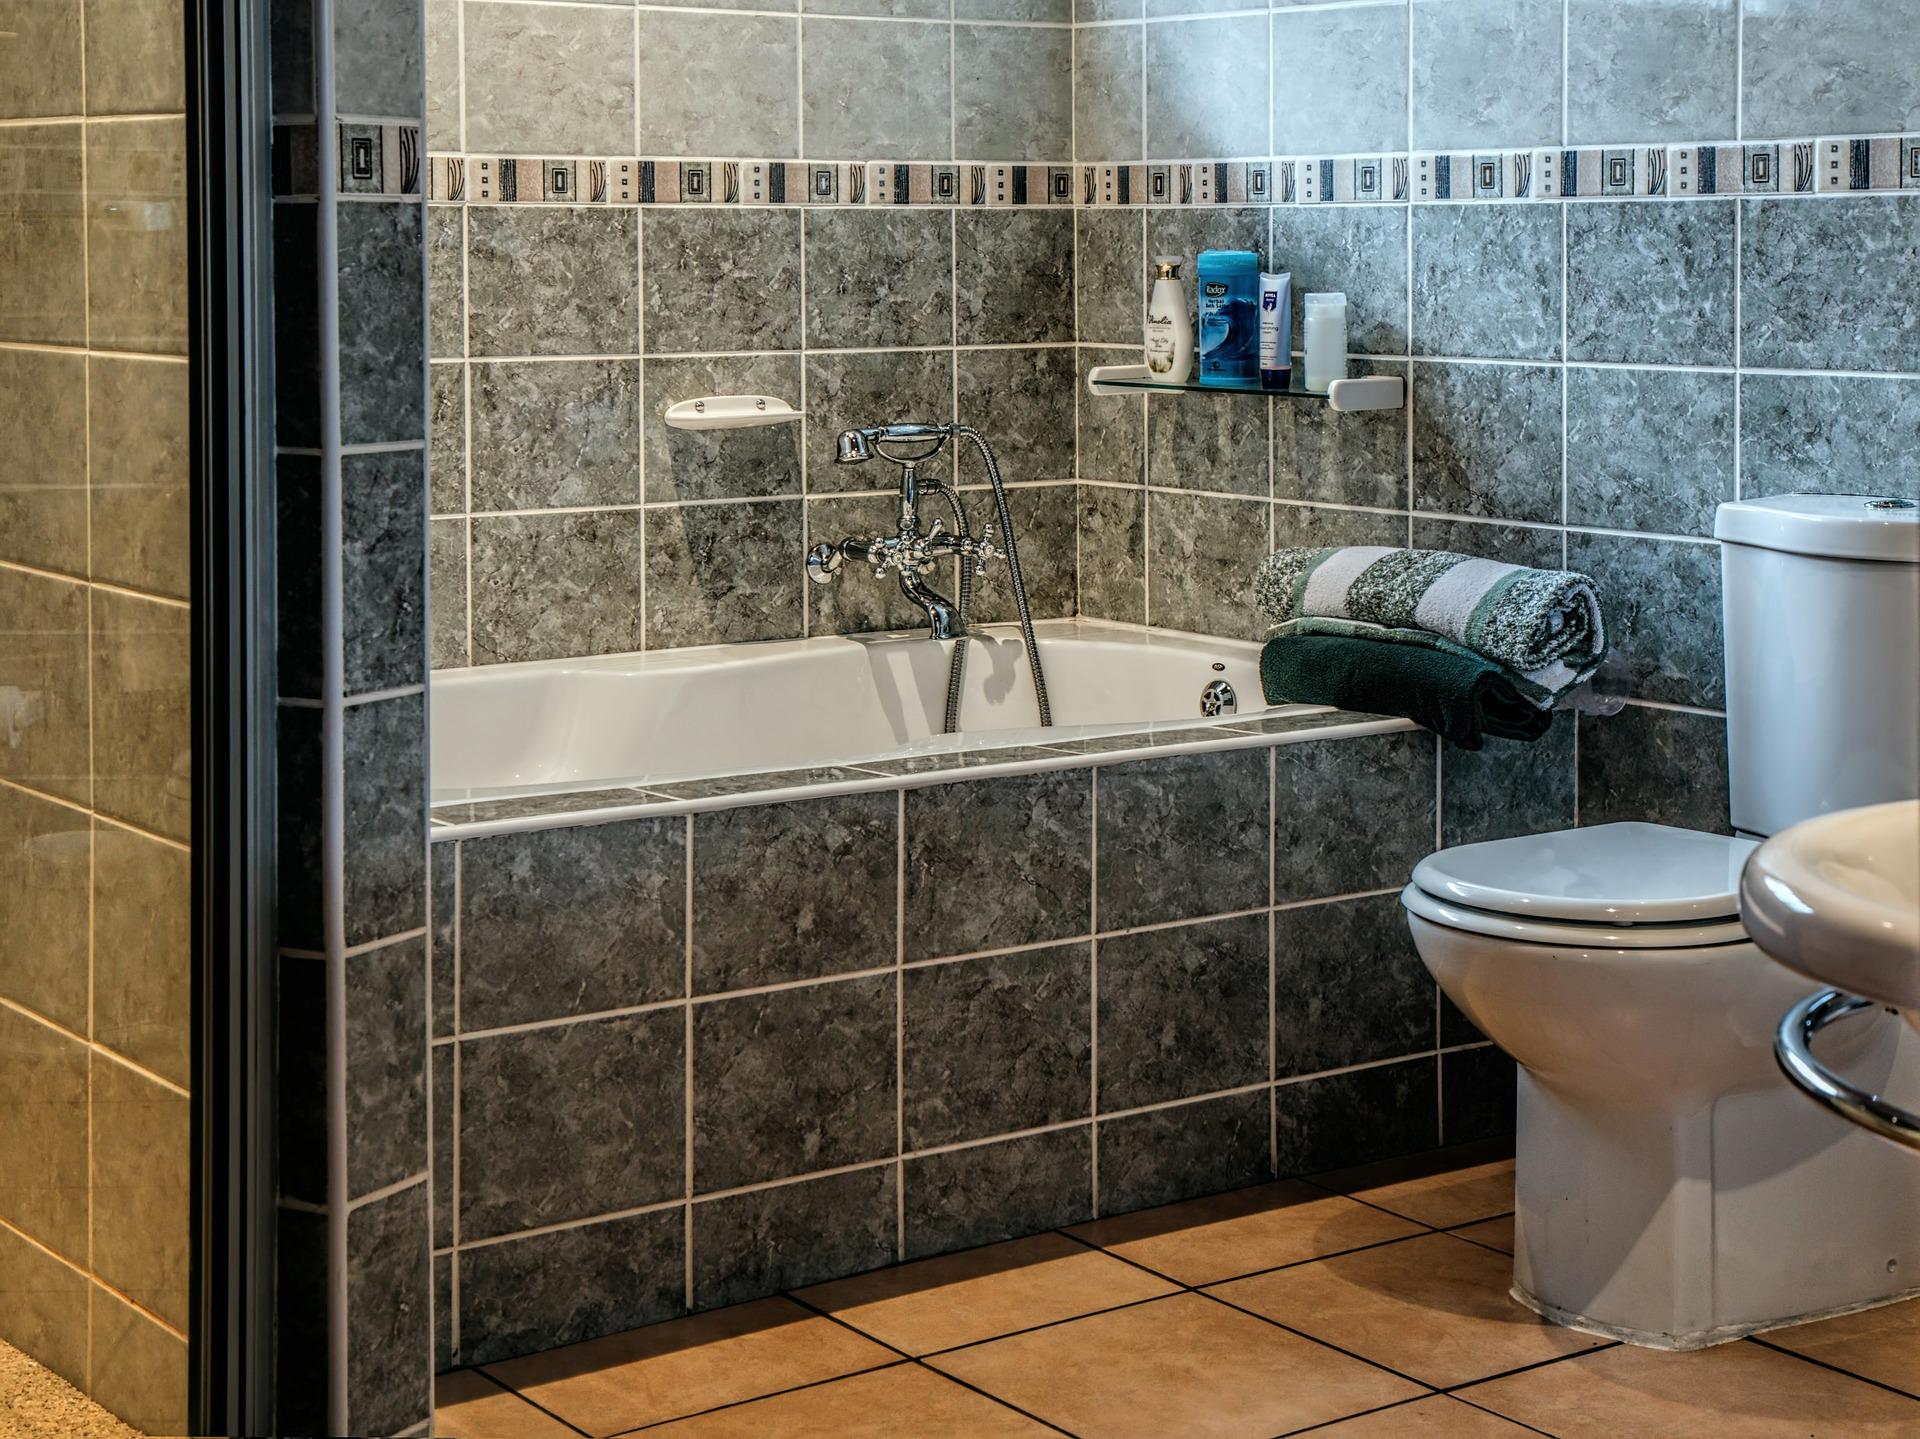 Low-flow-toilets